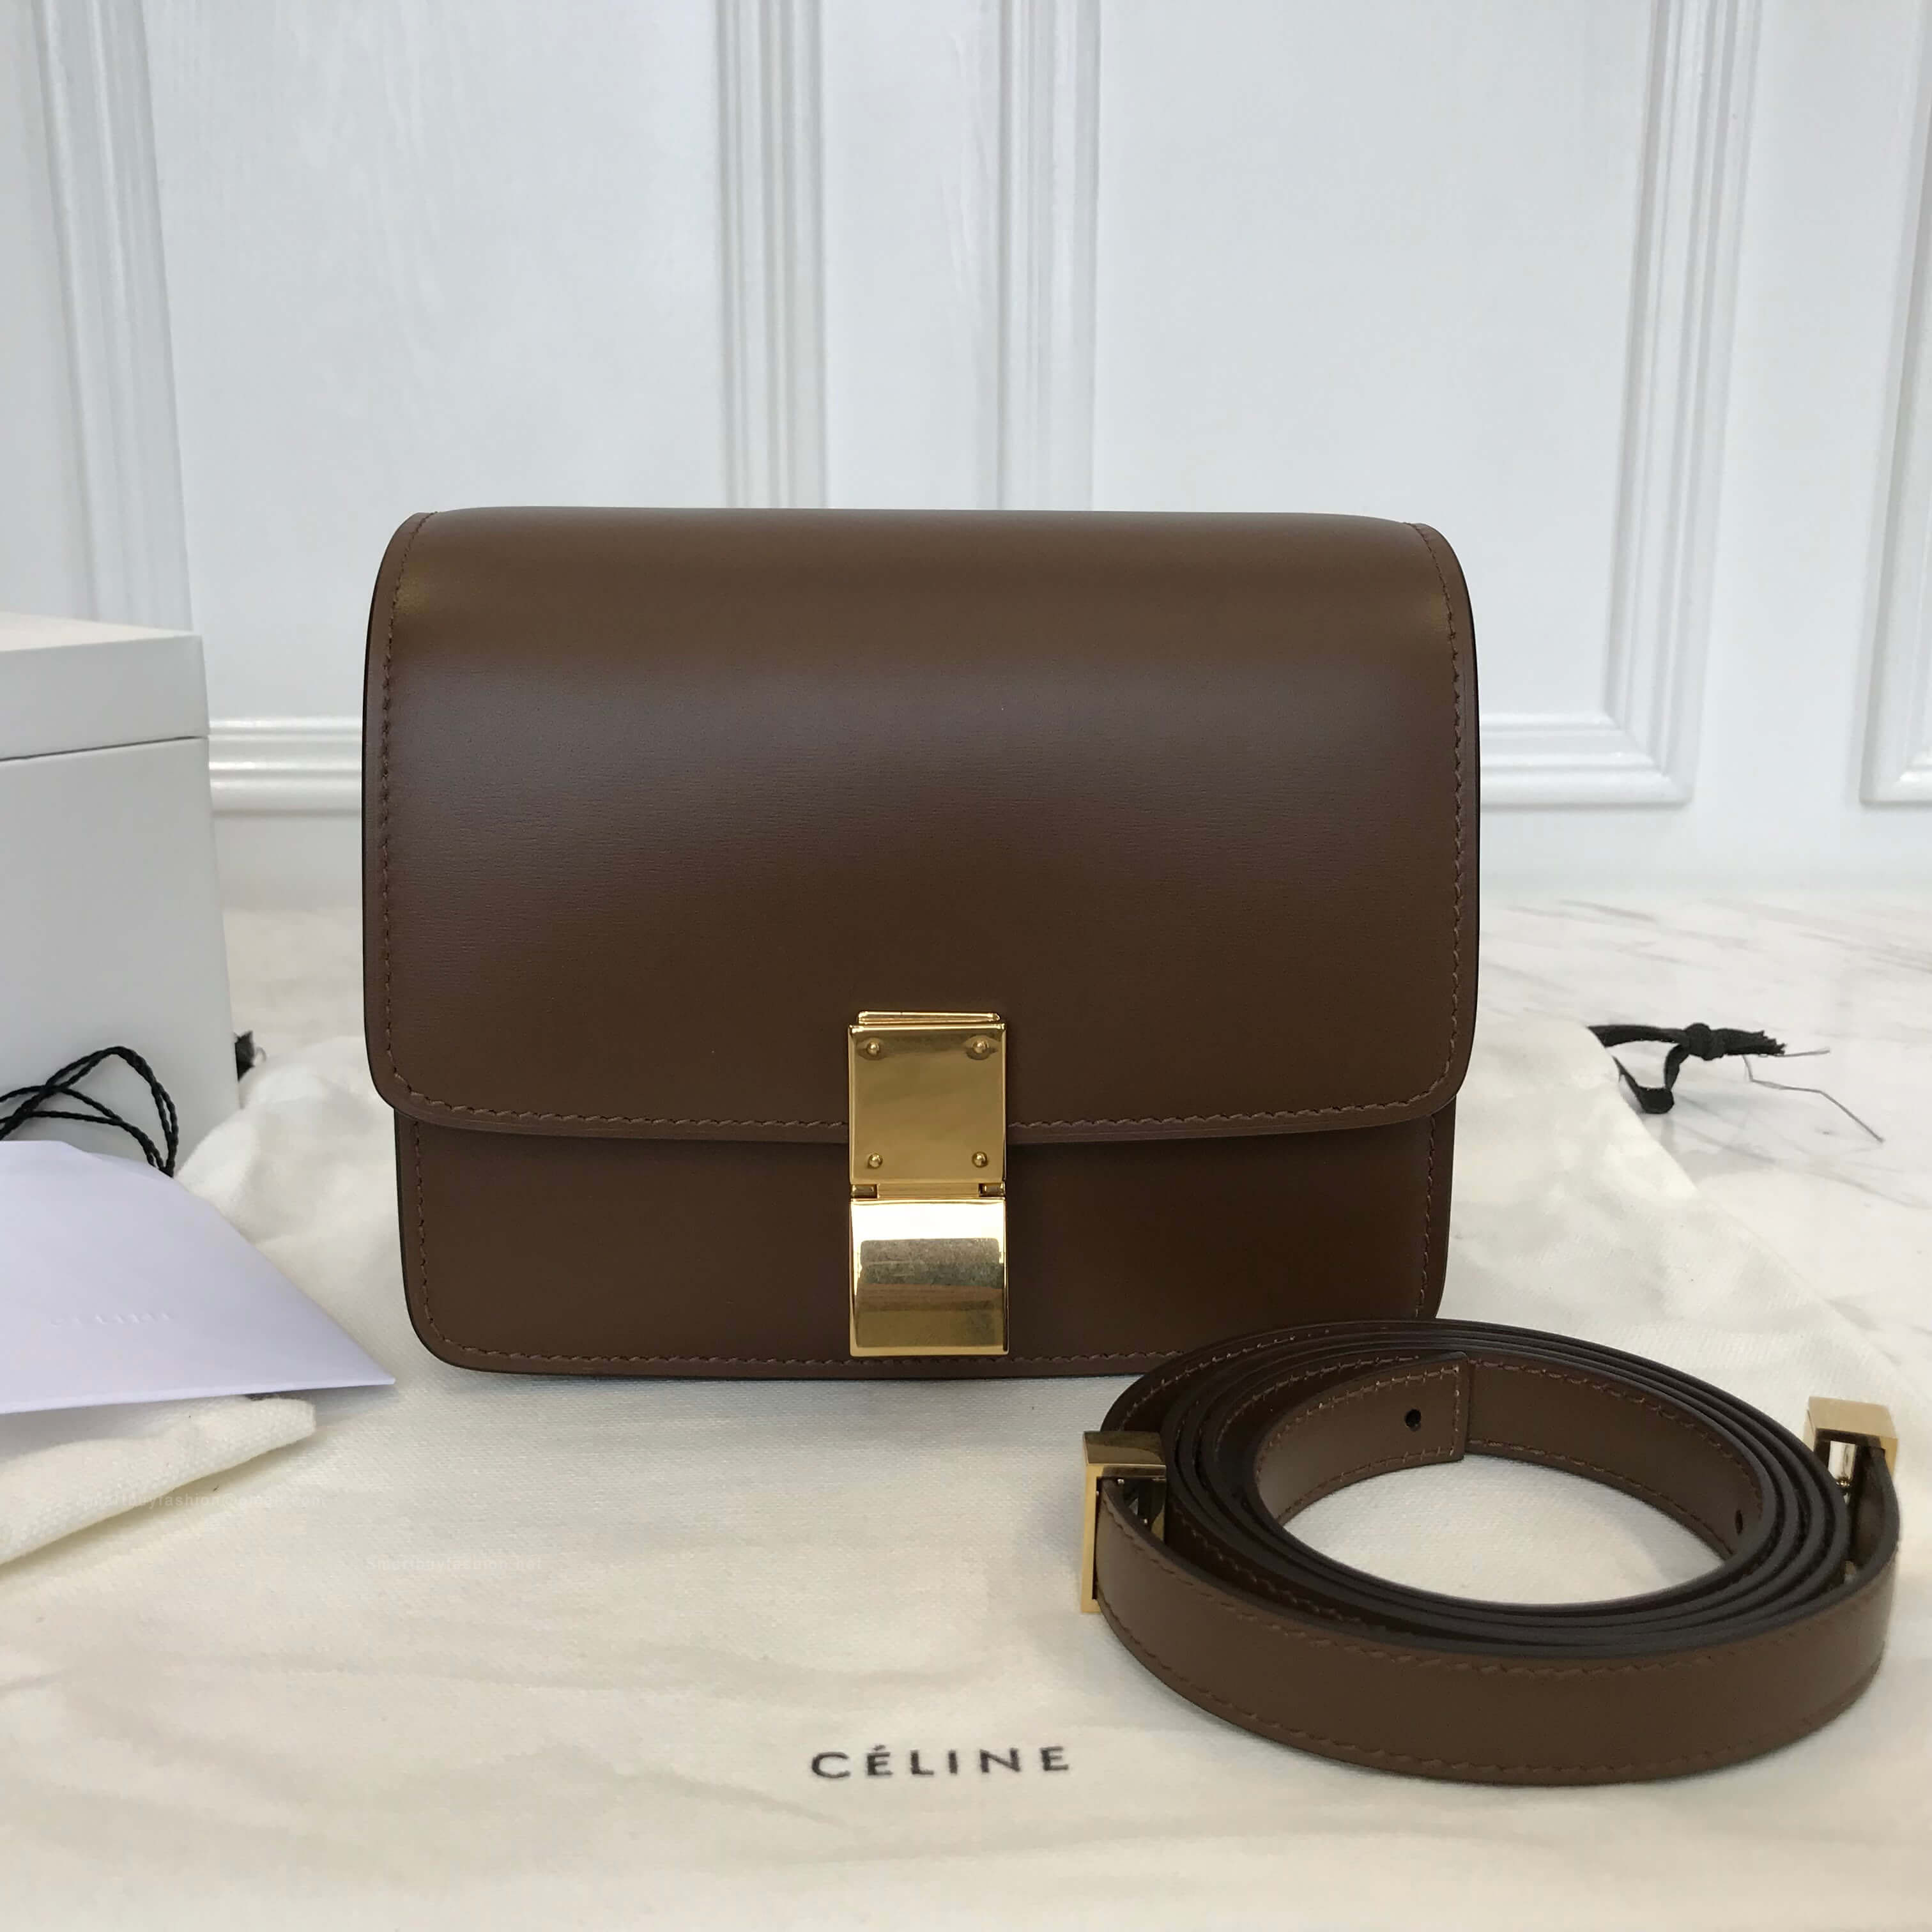 bc9e38f9f7d7 Celine Classic Box Bag Small in Brown Liege Calfskin